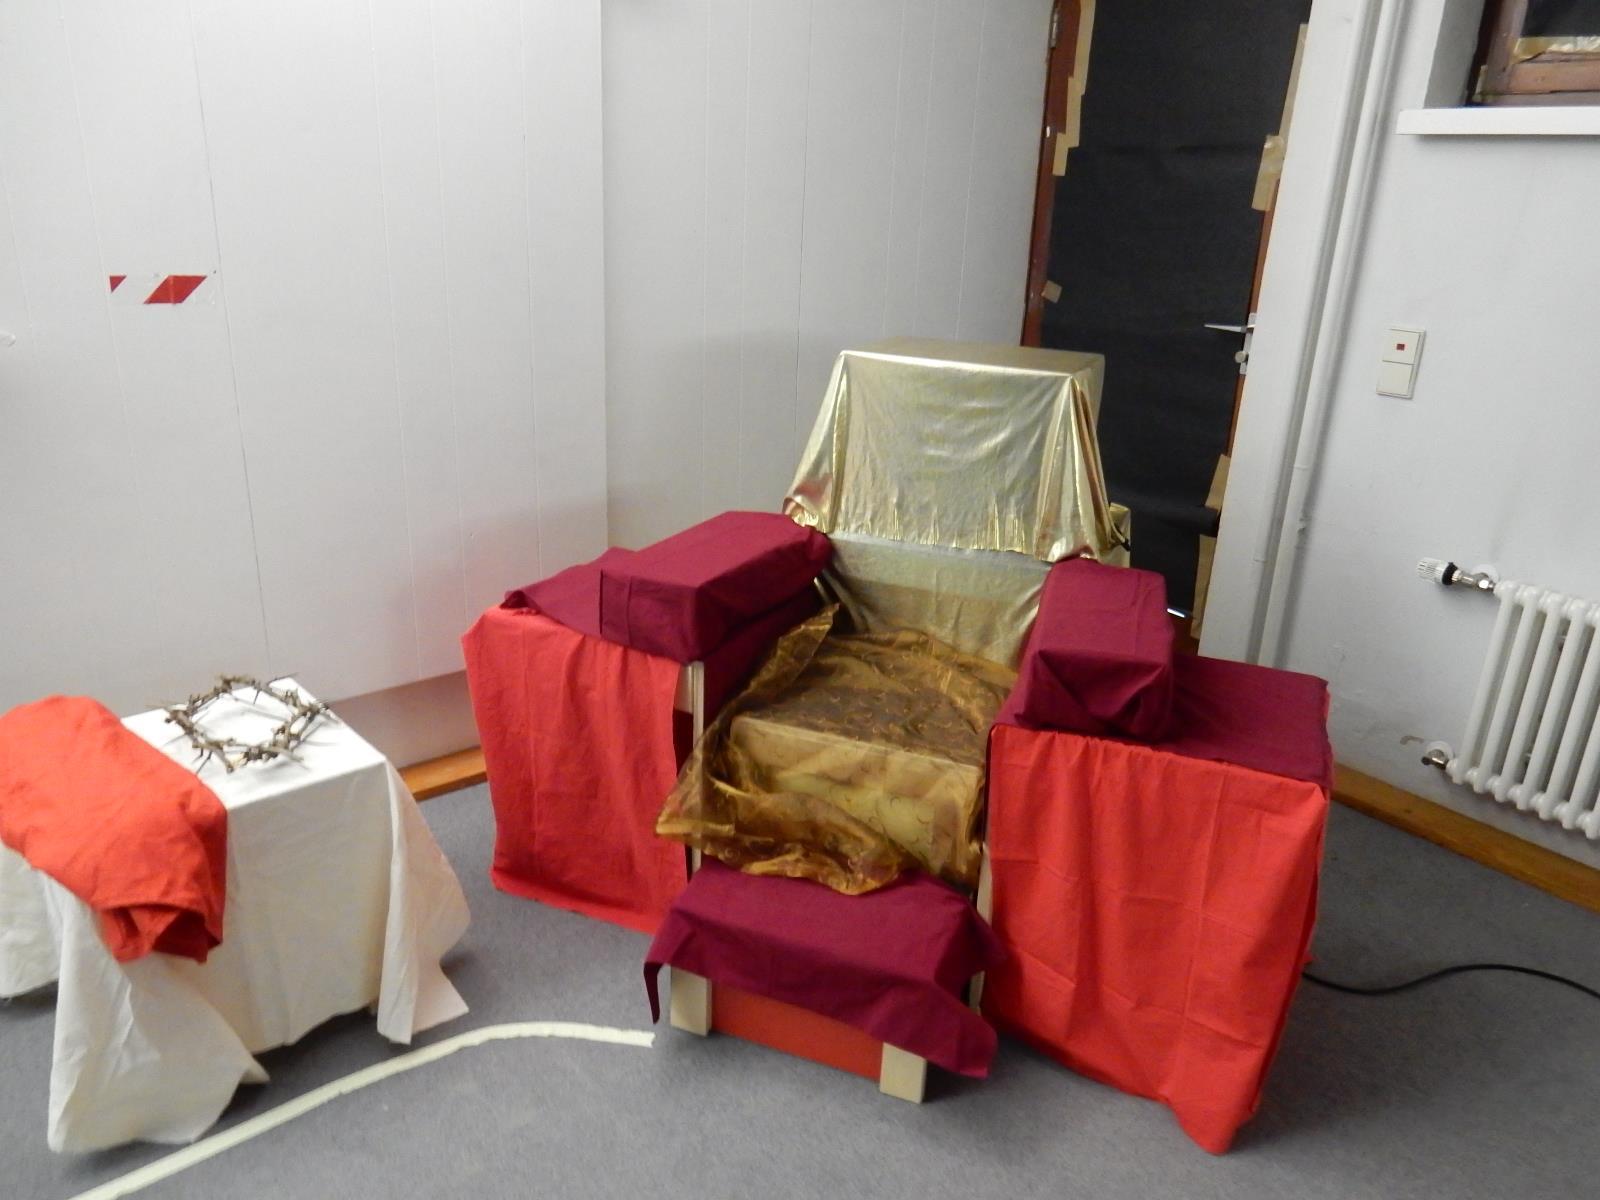 herzlich willkommen im kinderhaus agnes caritasverband. Black Bedroom Furniture Sets. Home Design Ideas